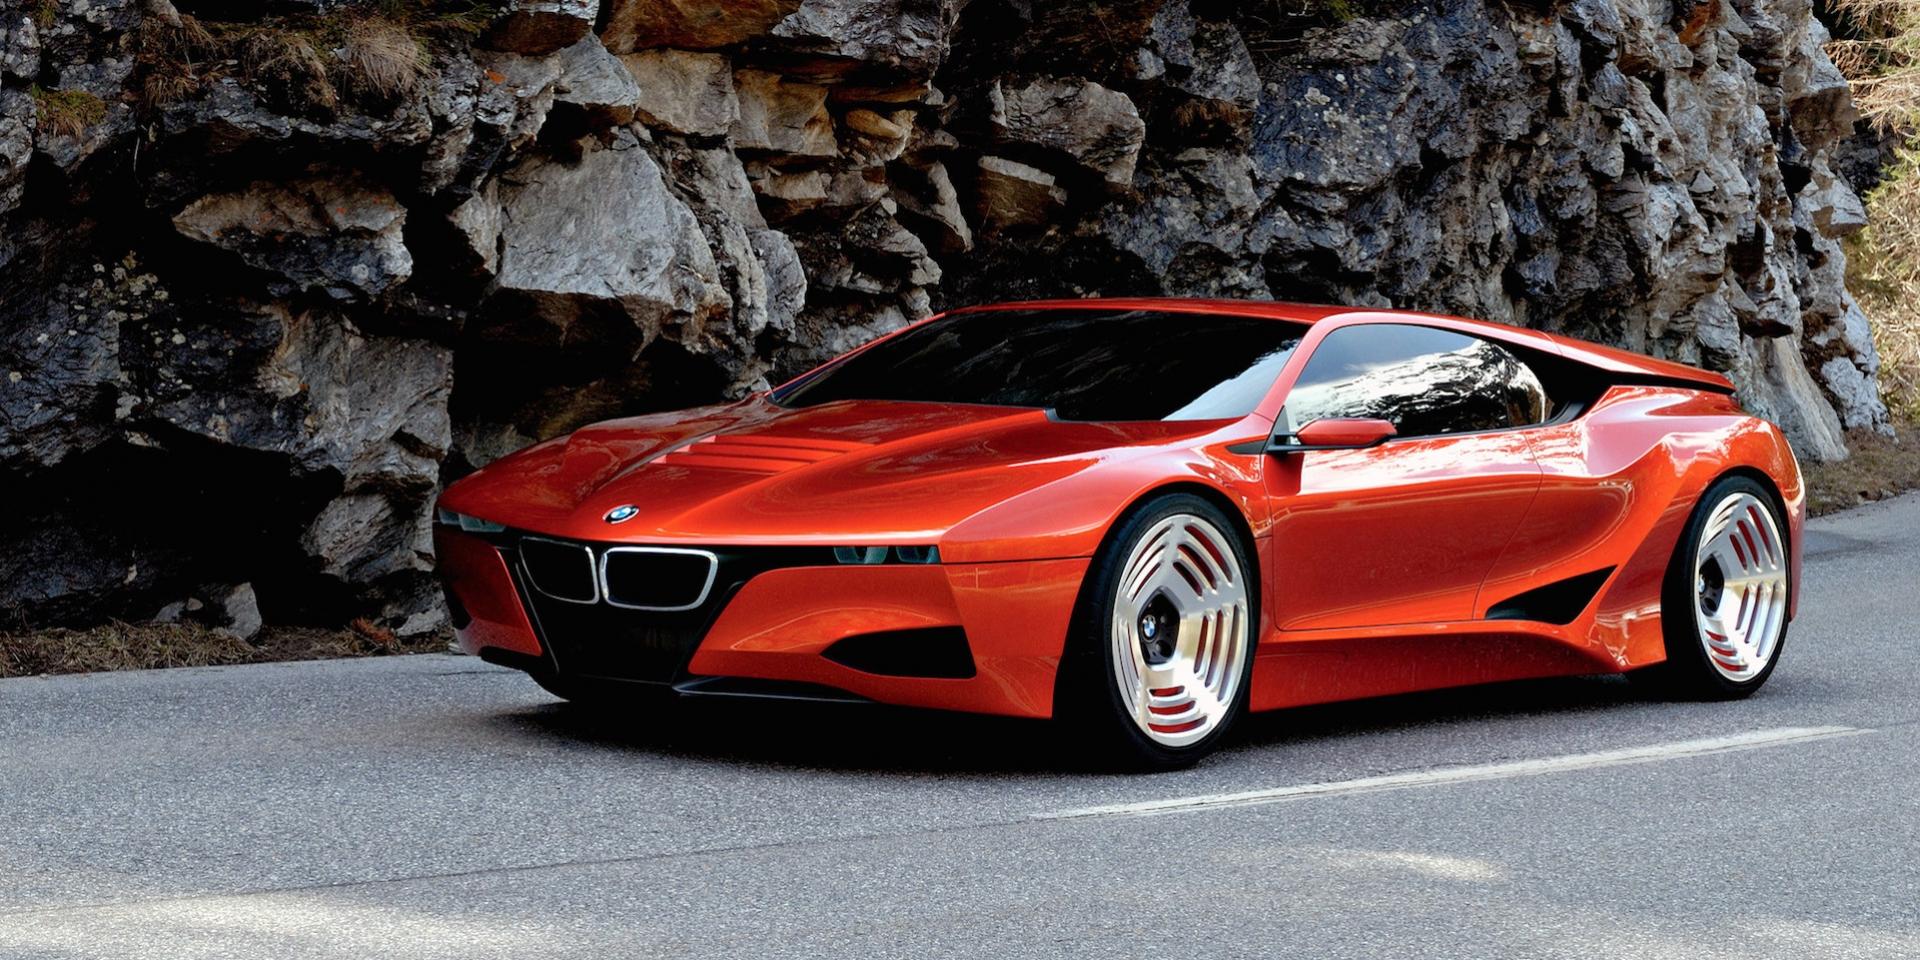 BMW M超級跑車有望!就等高層點頭研發!